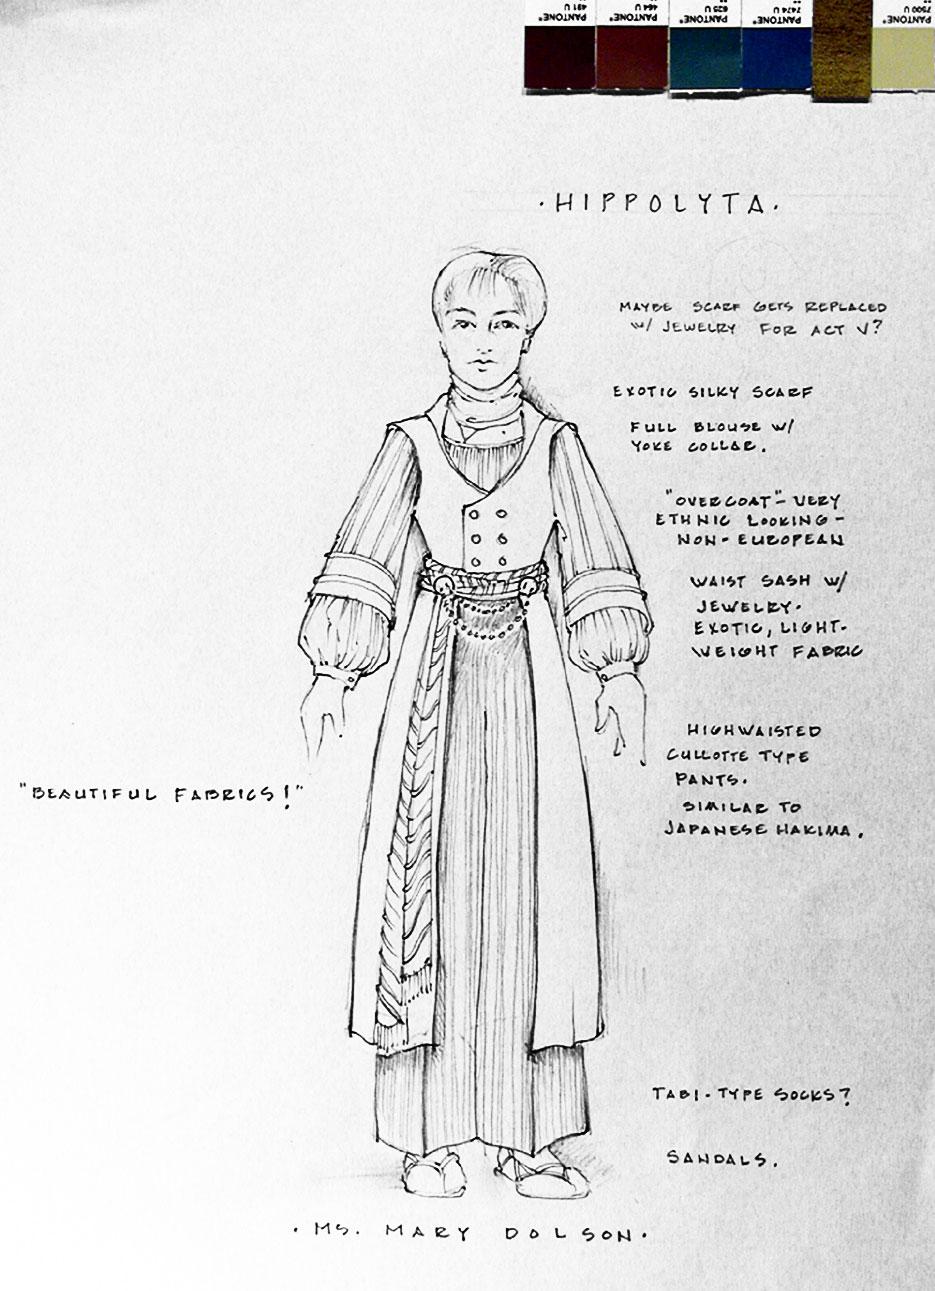 midsummer-nights-dream-hippolyta-costume-design-michael-ganio.jpg